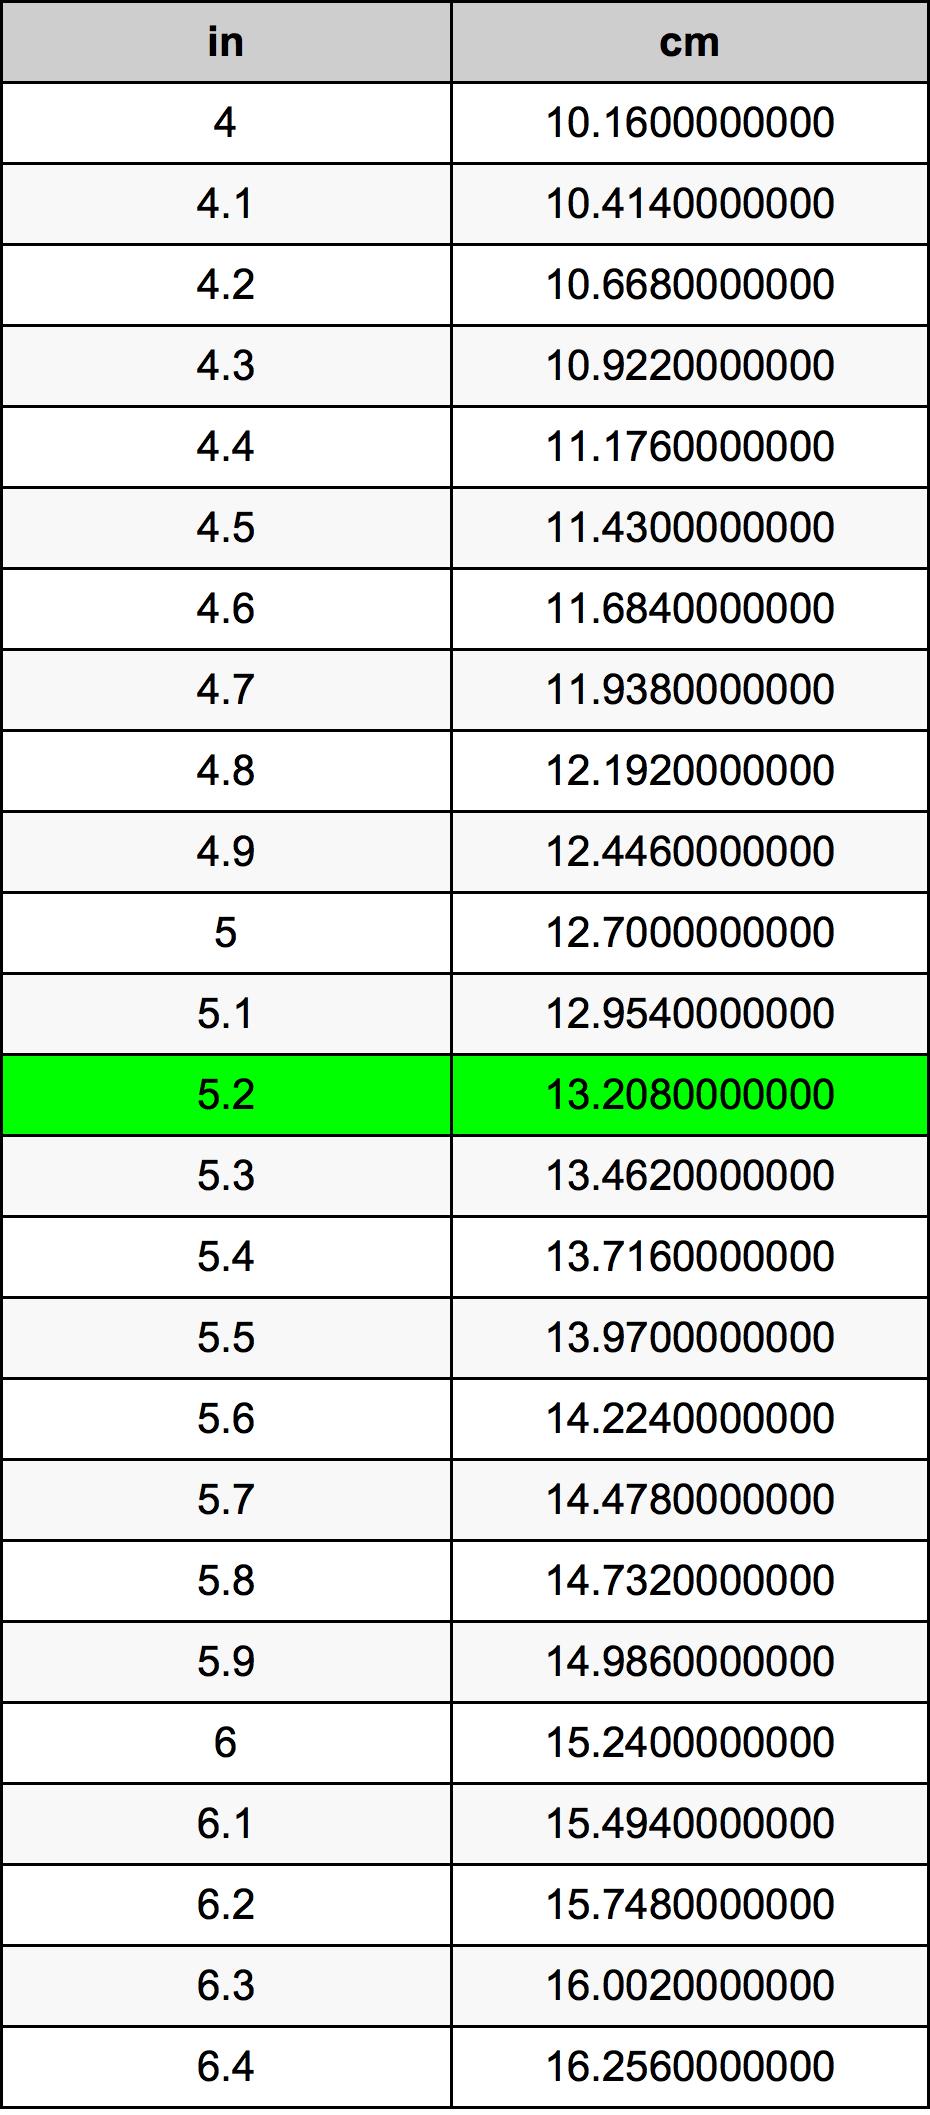 5.2 Pulgadas en Centímetros conversor de unidades   5.2 in en cm conversor de unidades